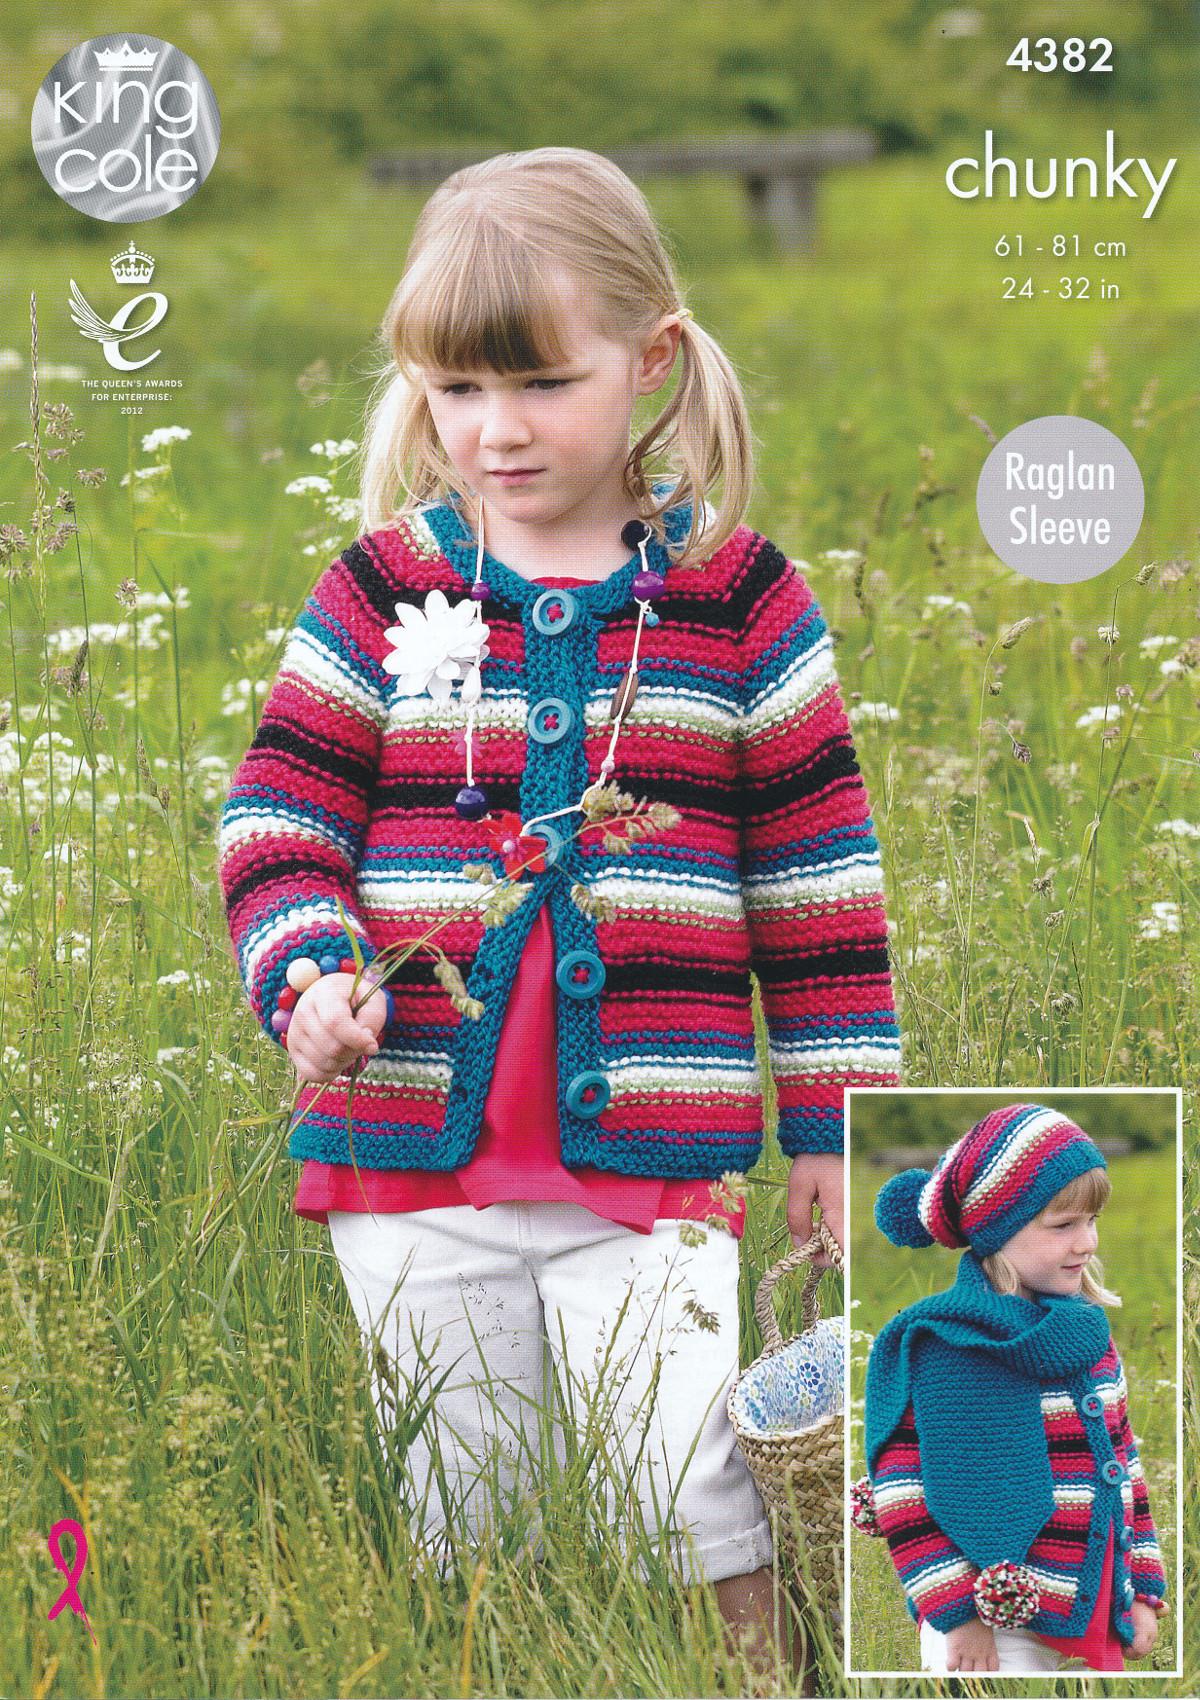 King Cole Knitting Pattern 3318 : Chunky Knitting Pattern King Cole Raglan Sleeve Cardigan Dress Hat Scarf 4382...